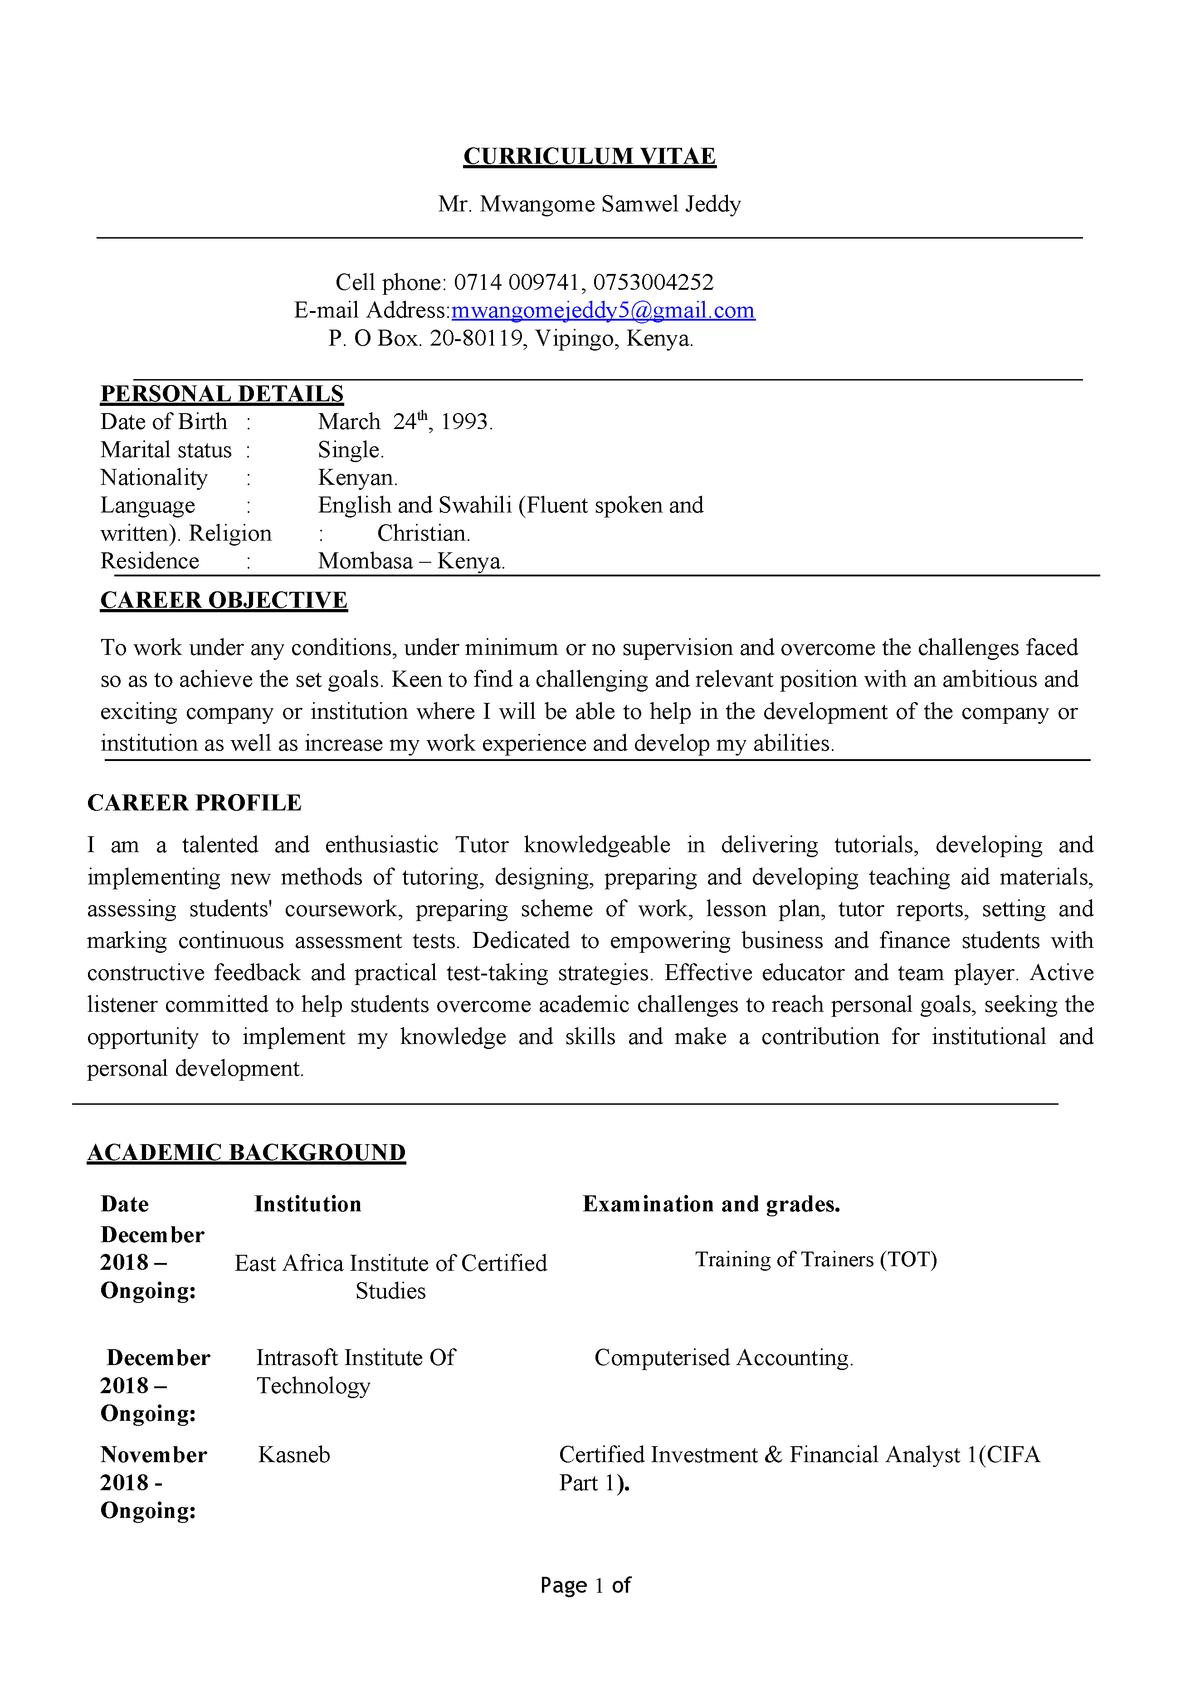 jeddy samwel mwangone - Bachelor of Commerce - StuDocu